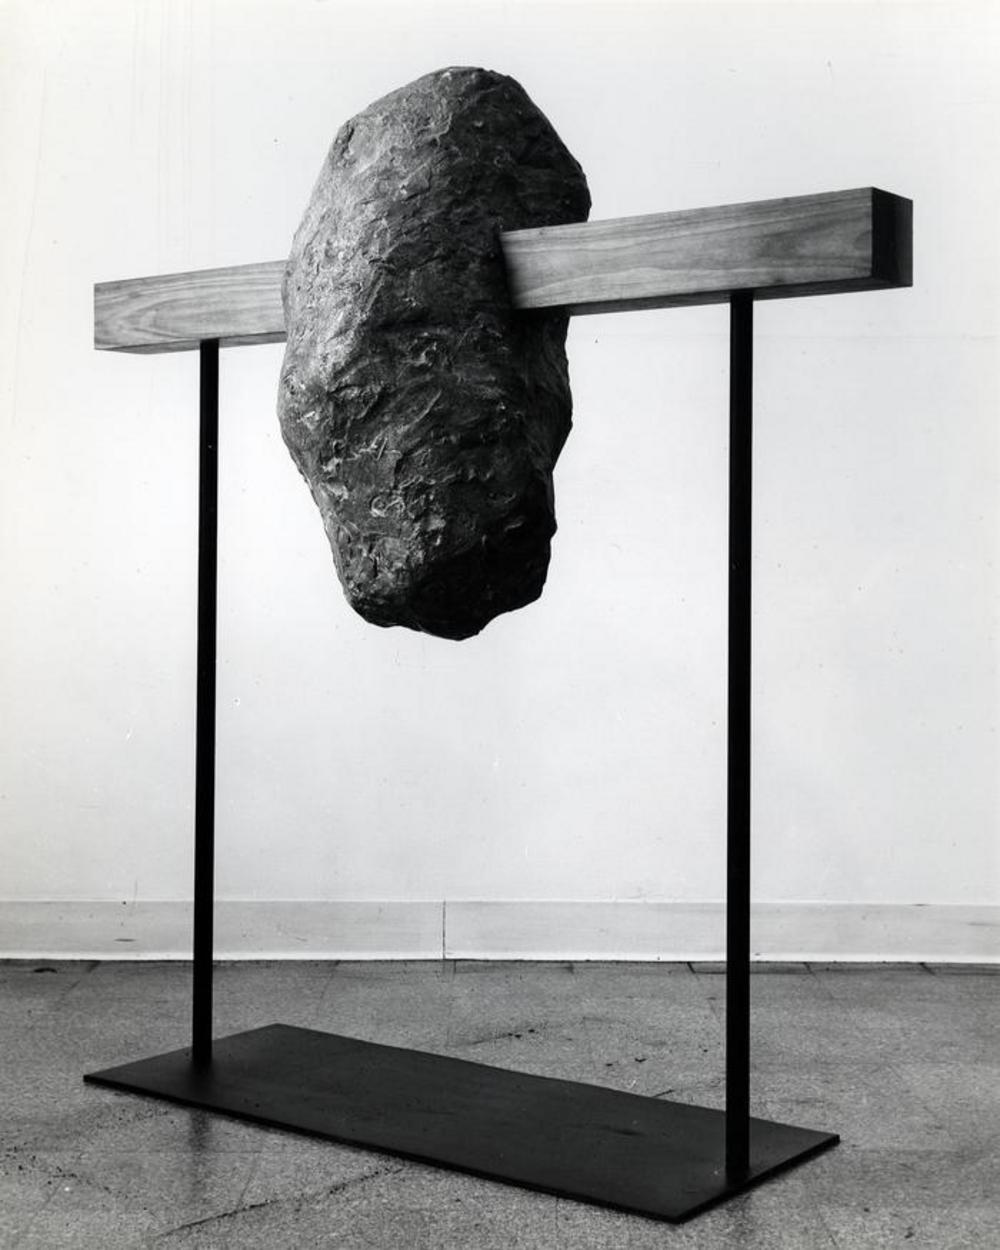 Stone of Spiritual Understanding, image 2